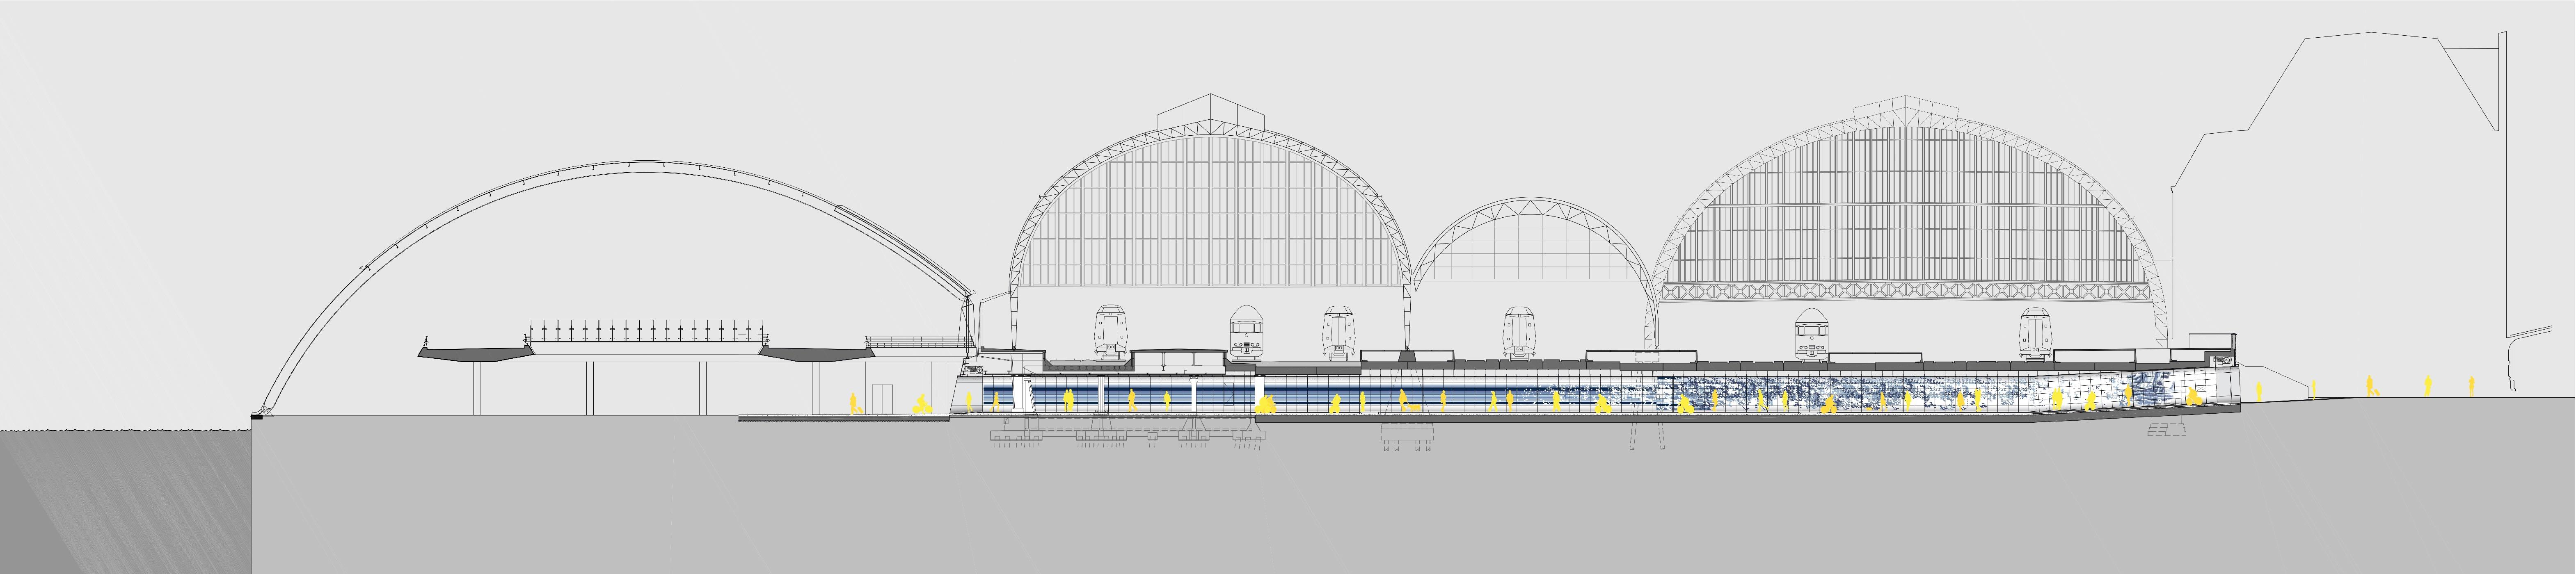 Benthem Crouwel Architekten, Jannes Linders · Cycle and